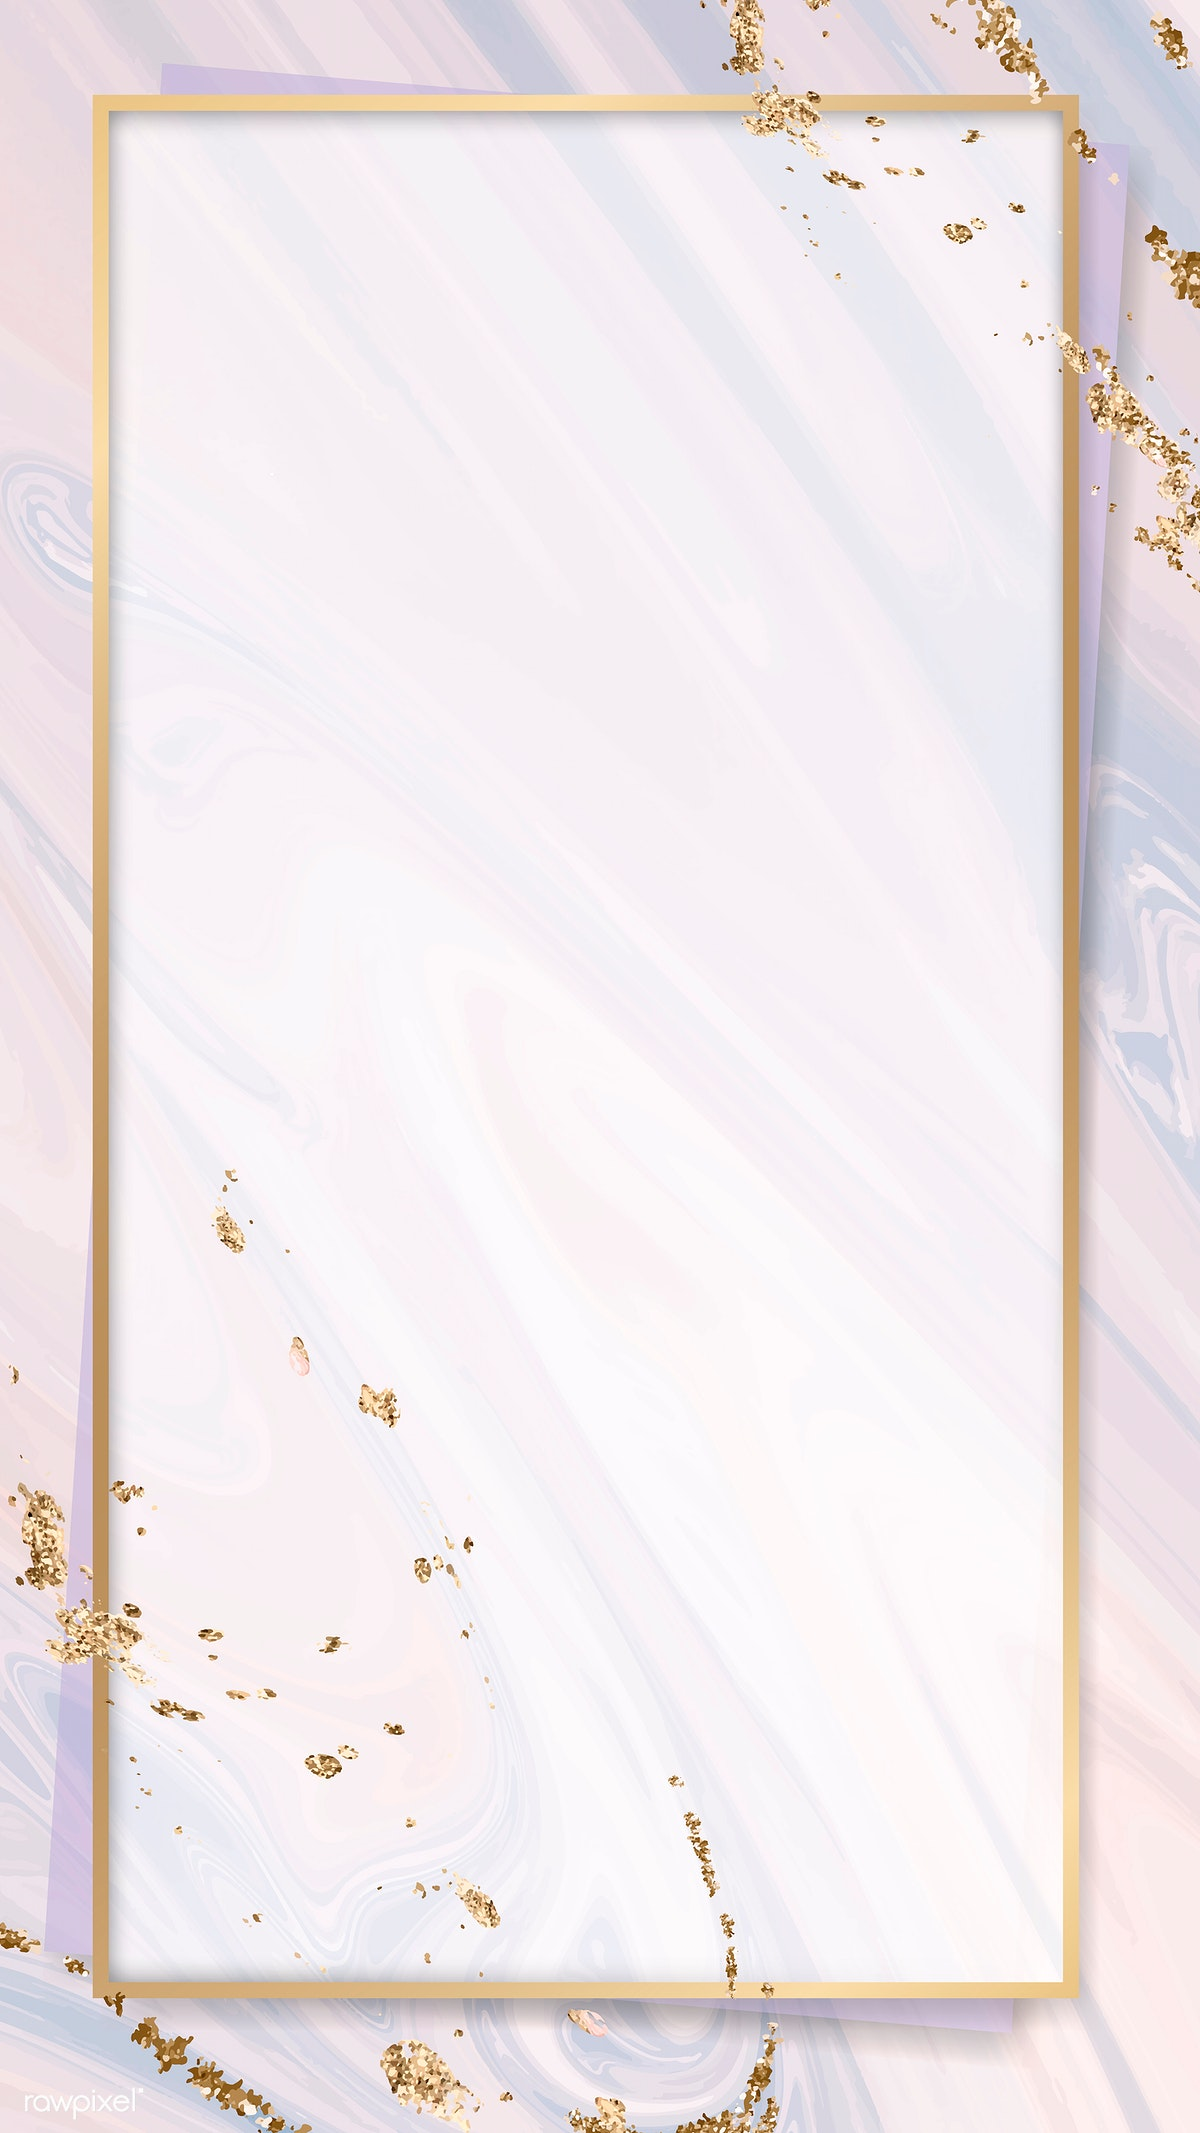 Download premium image of Rectangle gold frame on pink fluid patterned